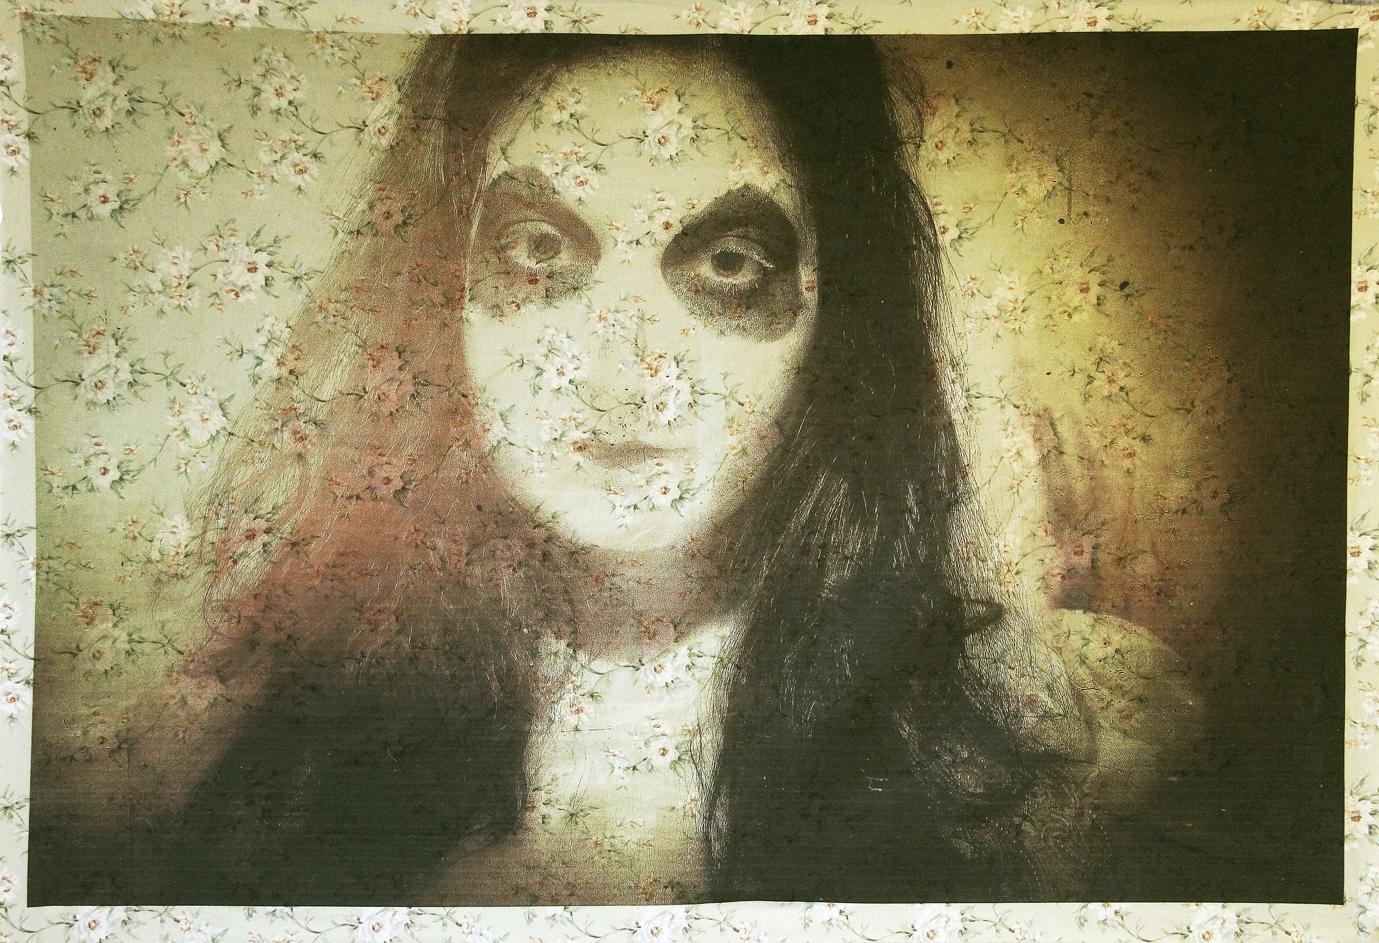 'Laura' (2013) Image courtesy of Nick Mastro.